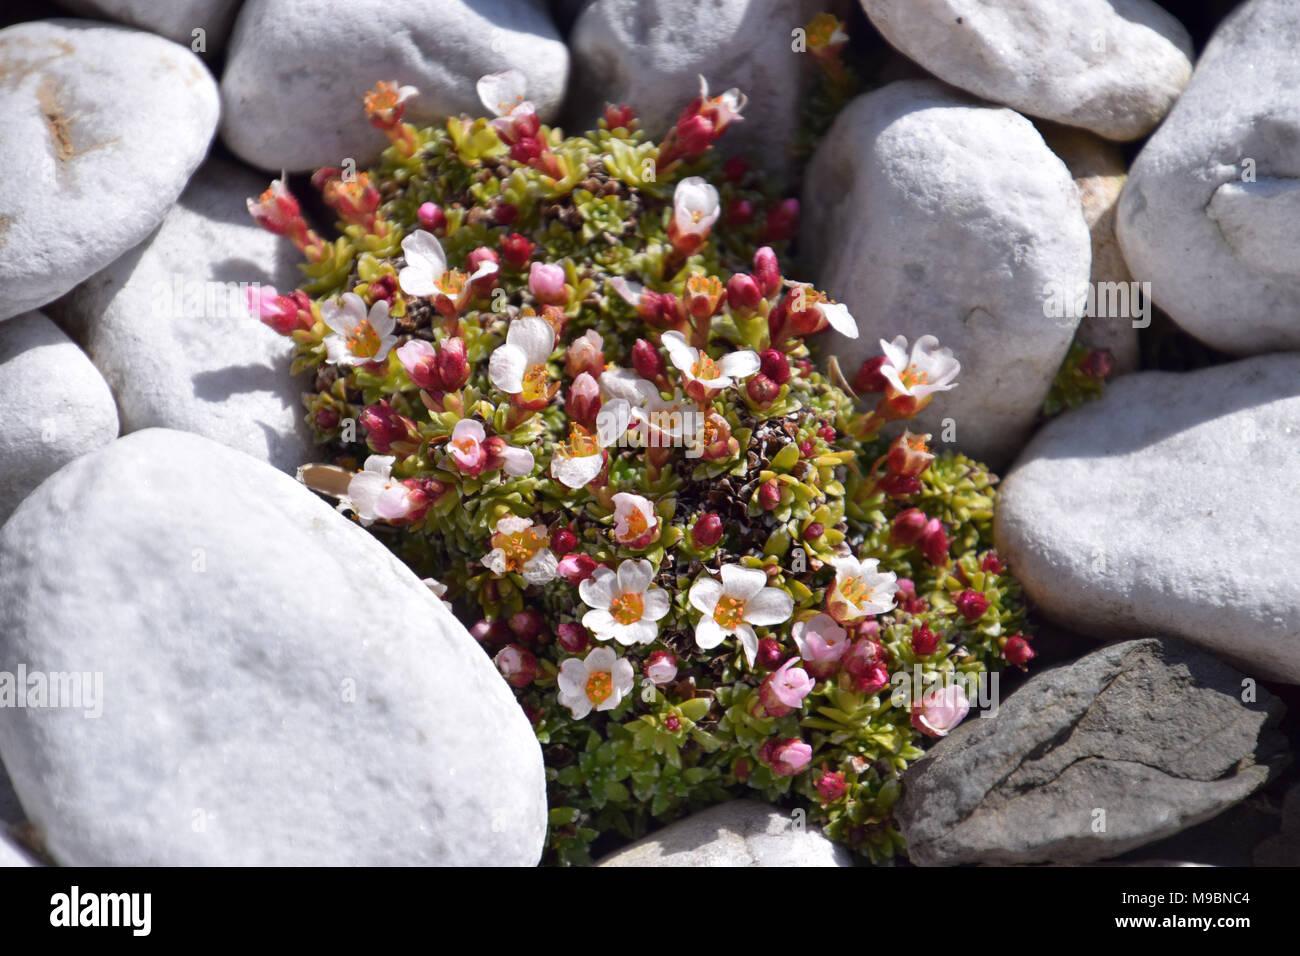 close up view of mini succulent plants - Stock Image